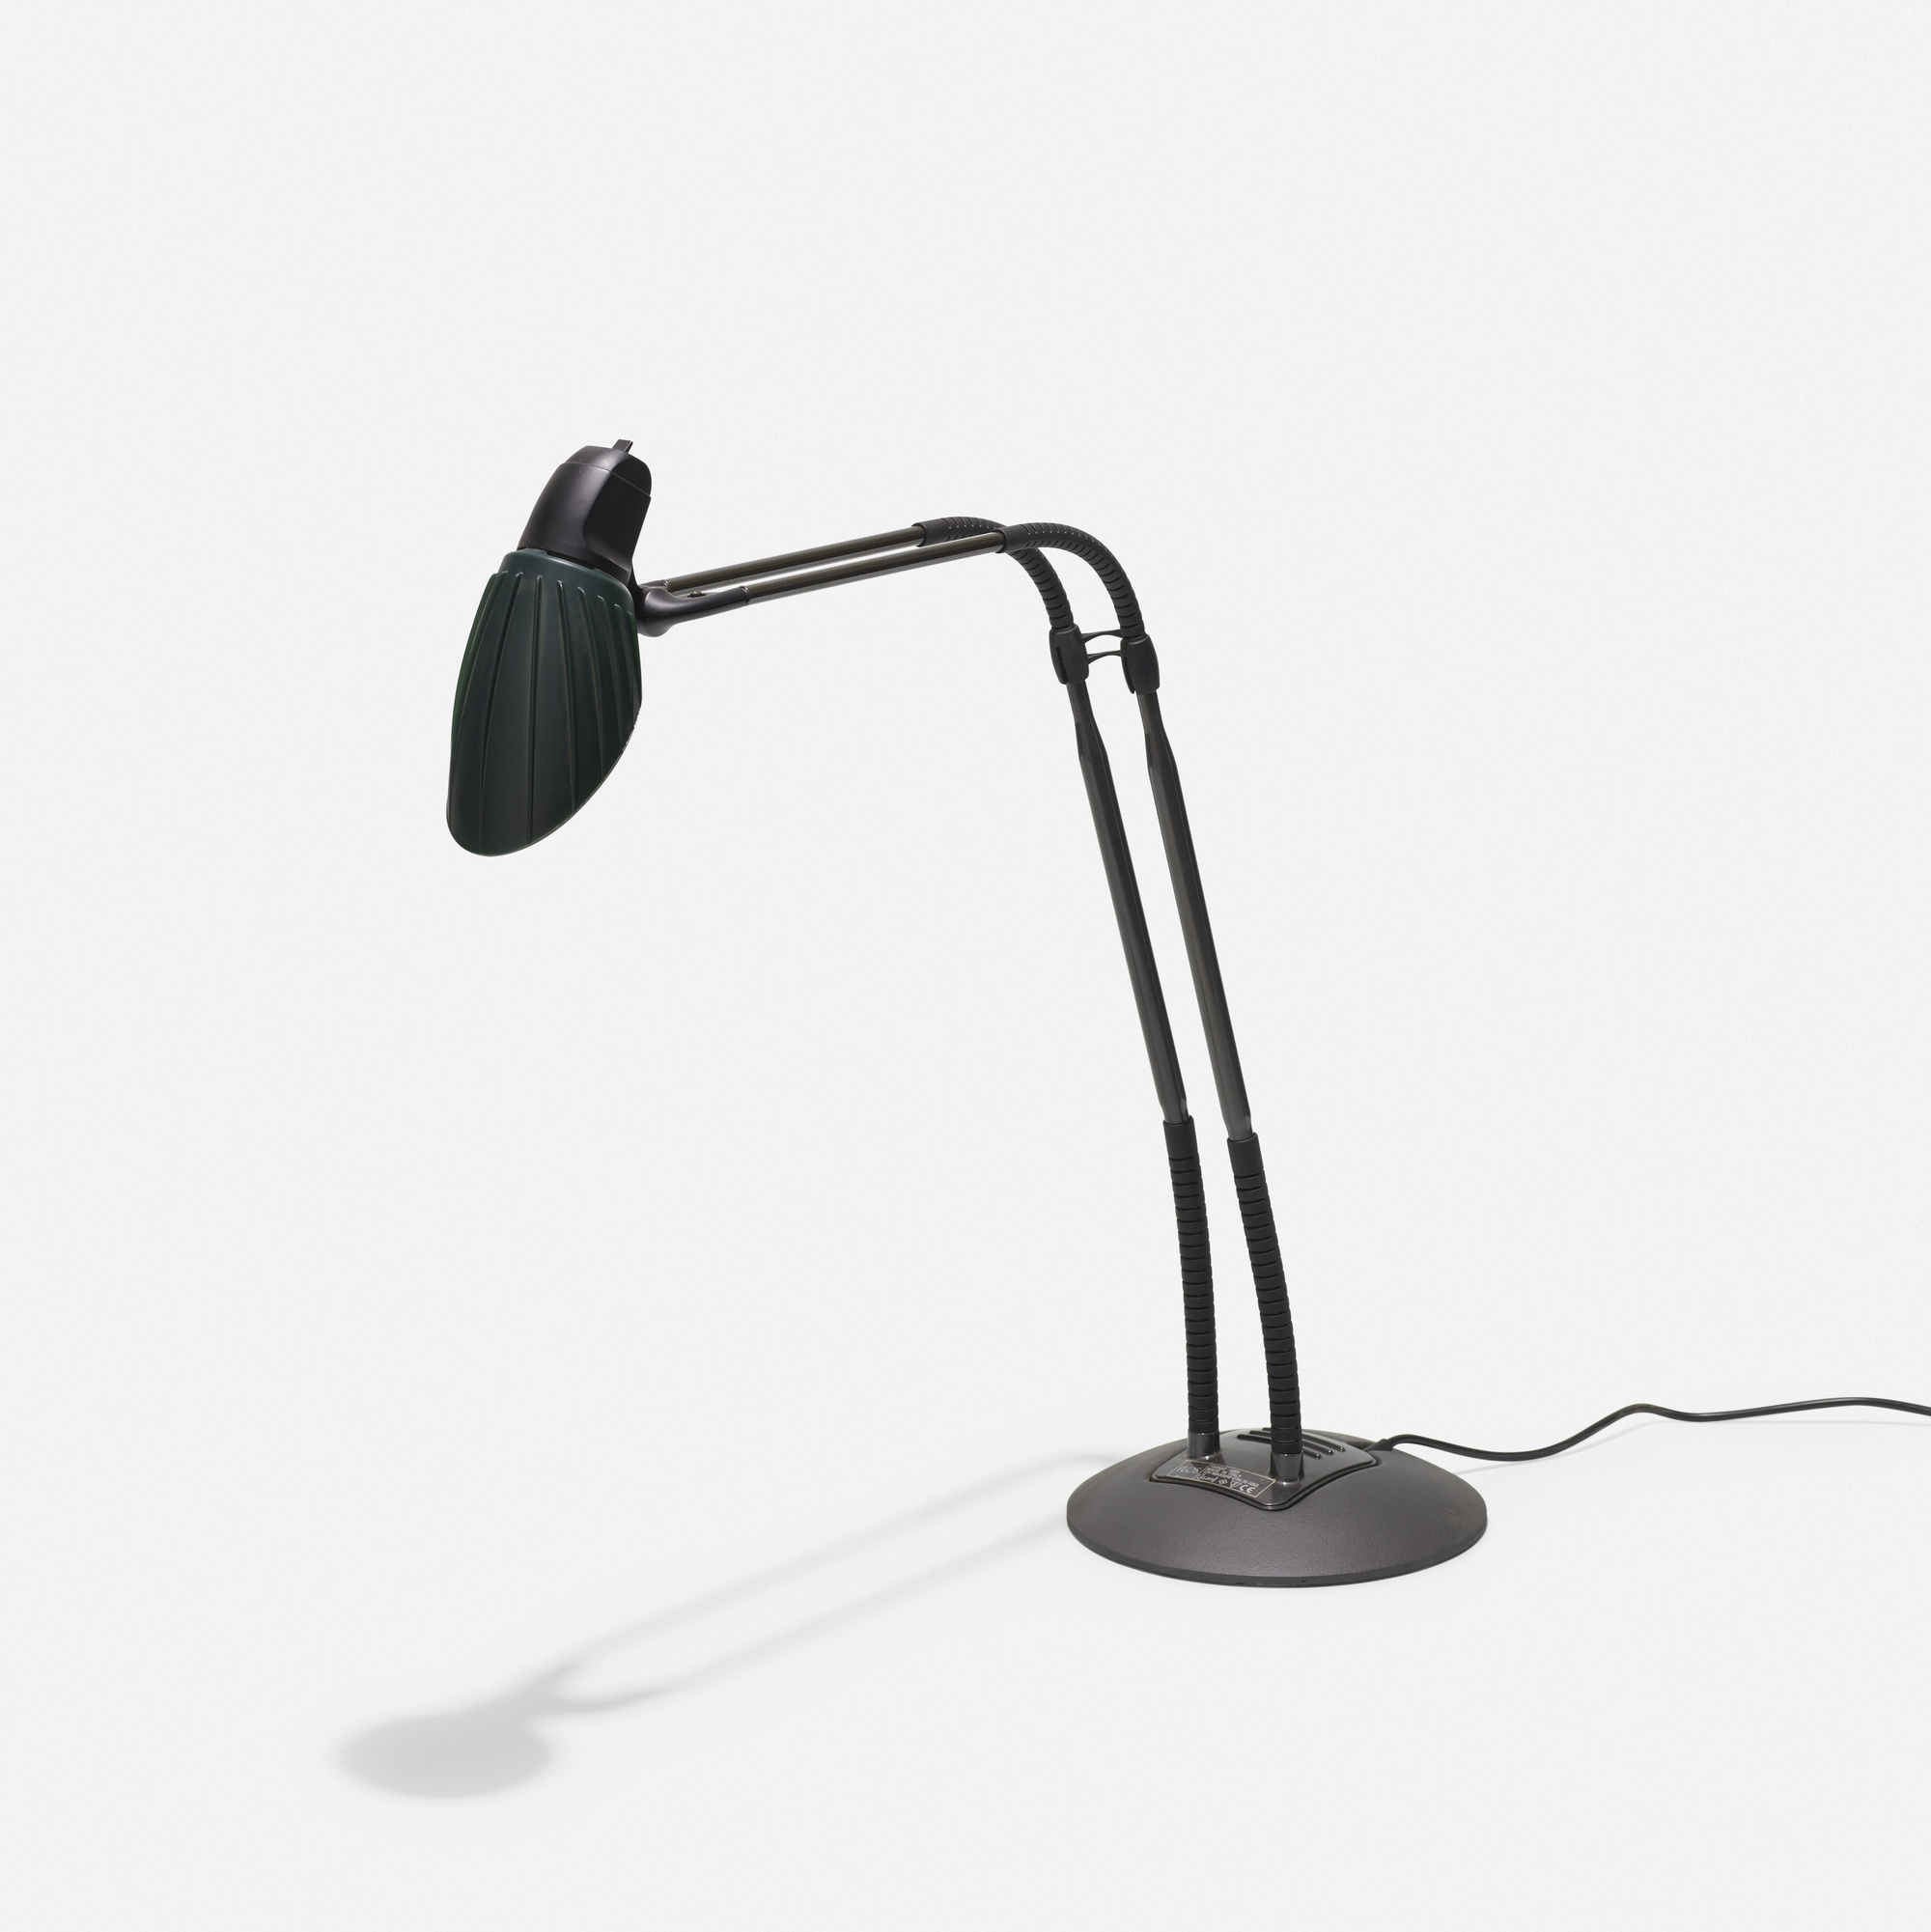 312: Stephan Copeland / Tango table lamp (1 of 2)